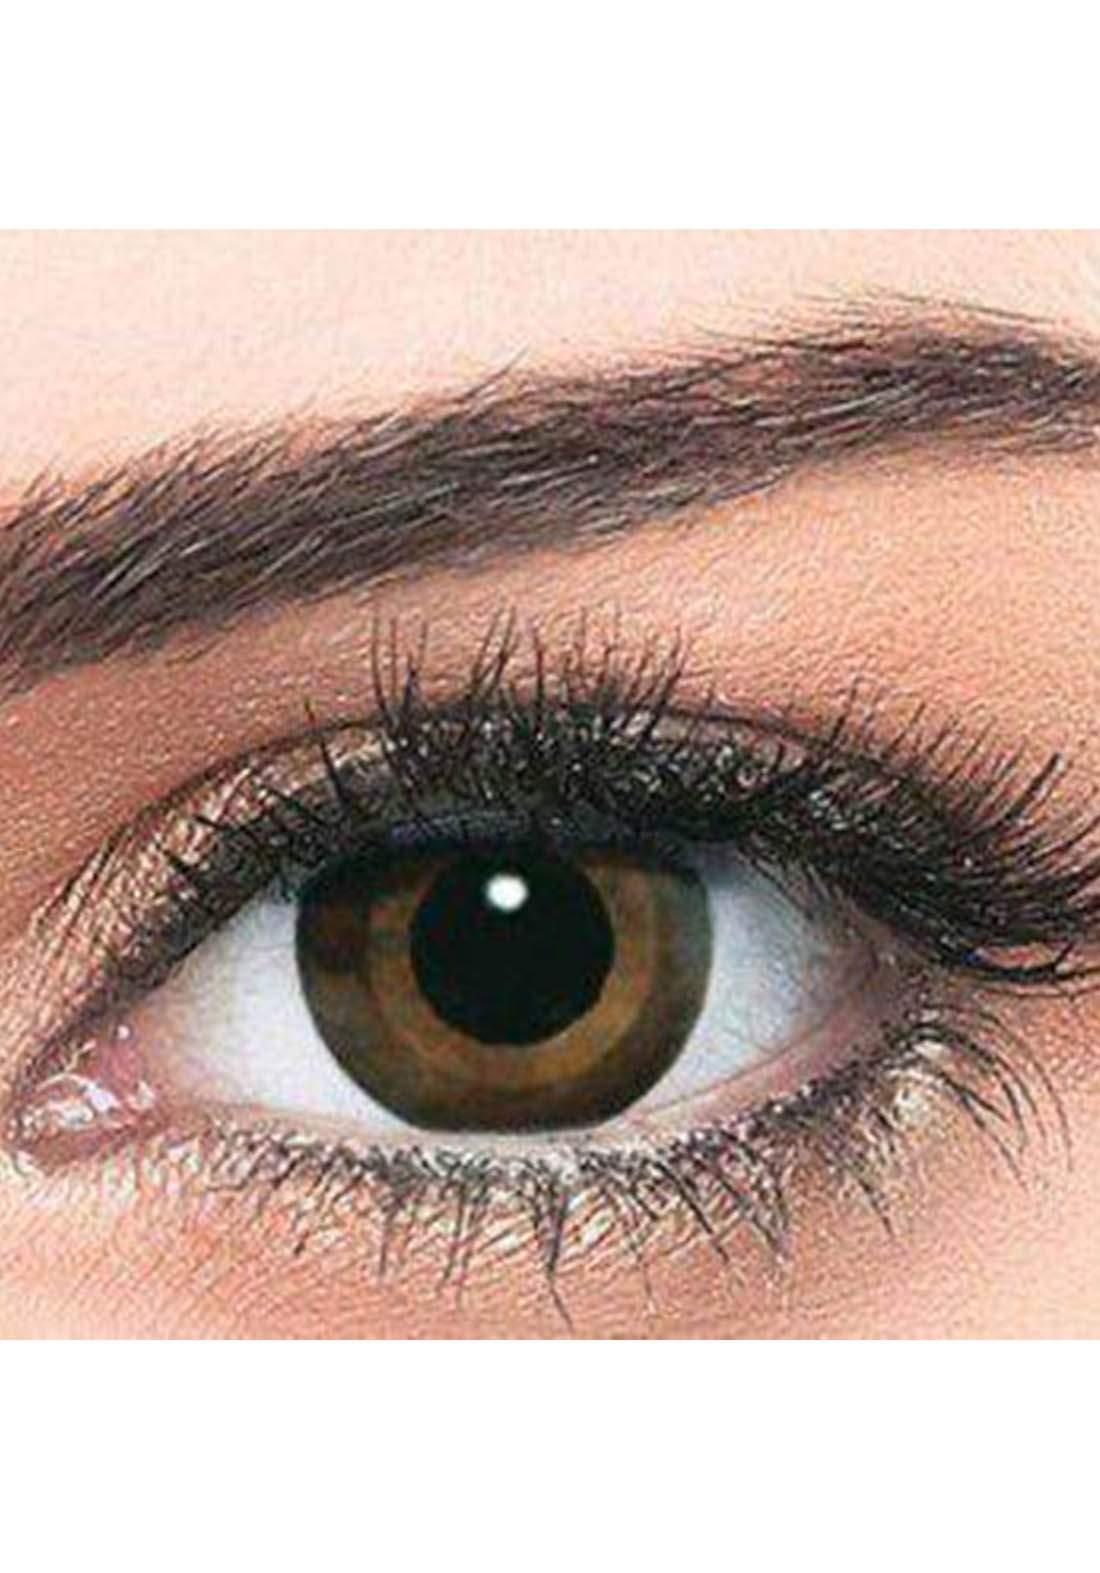 Bella Classic 301009 Contact Lenses 3 Months Use Elegance - Define  No.9 عدسات لاصقة